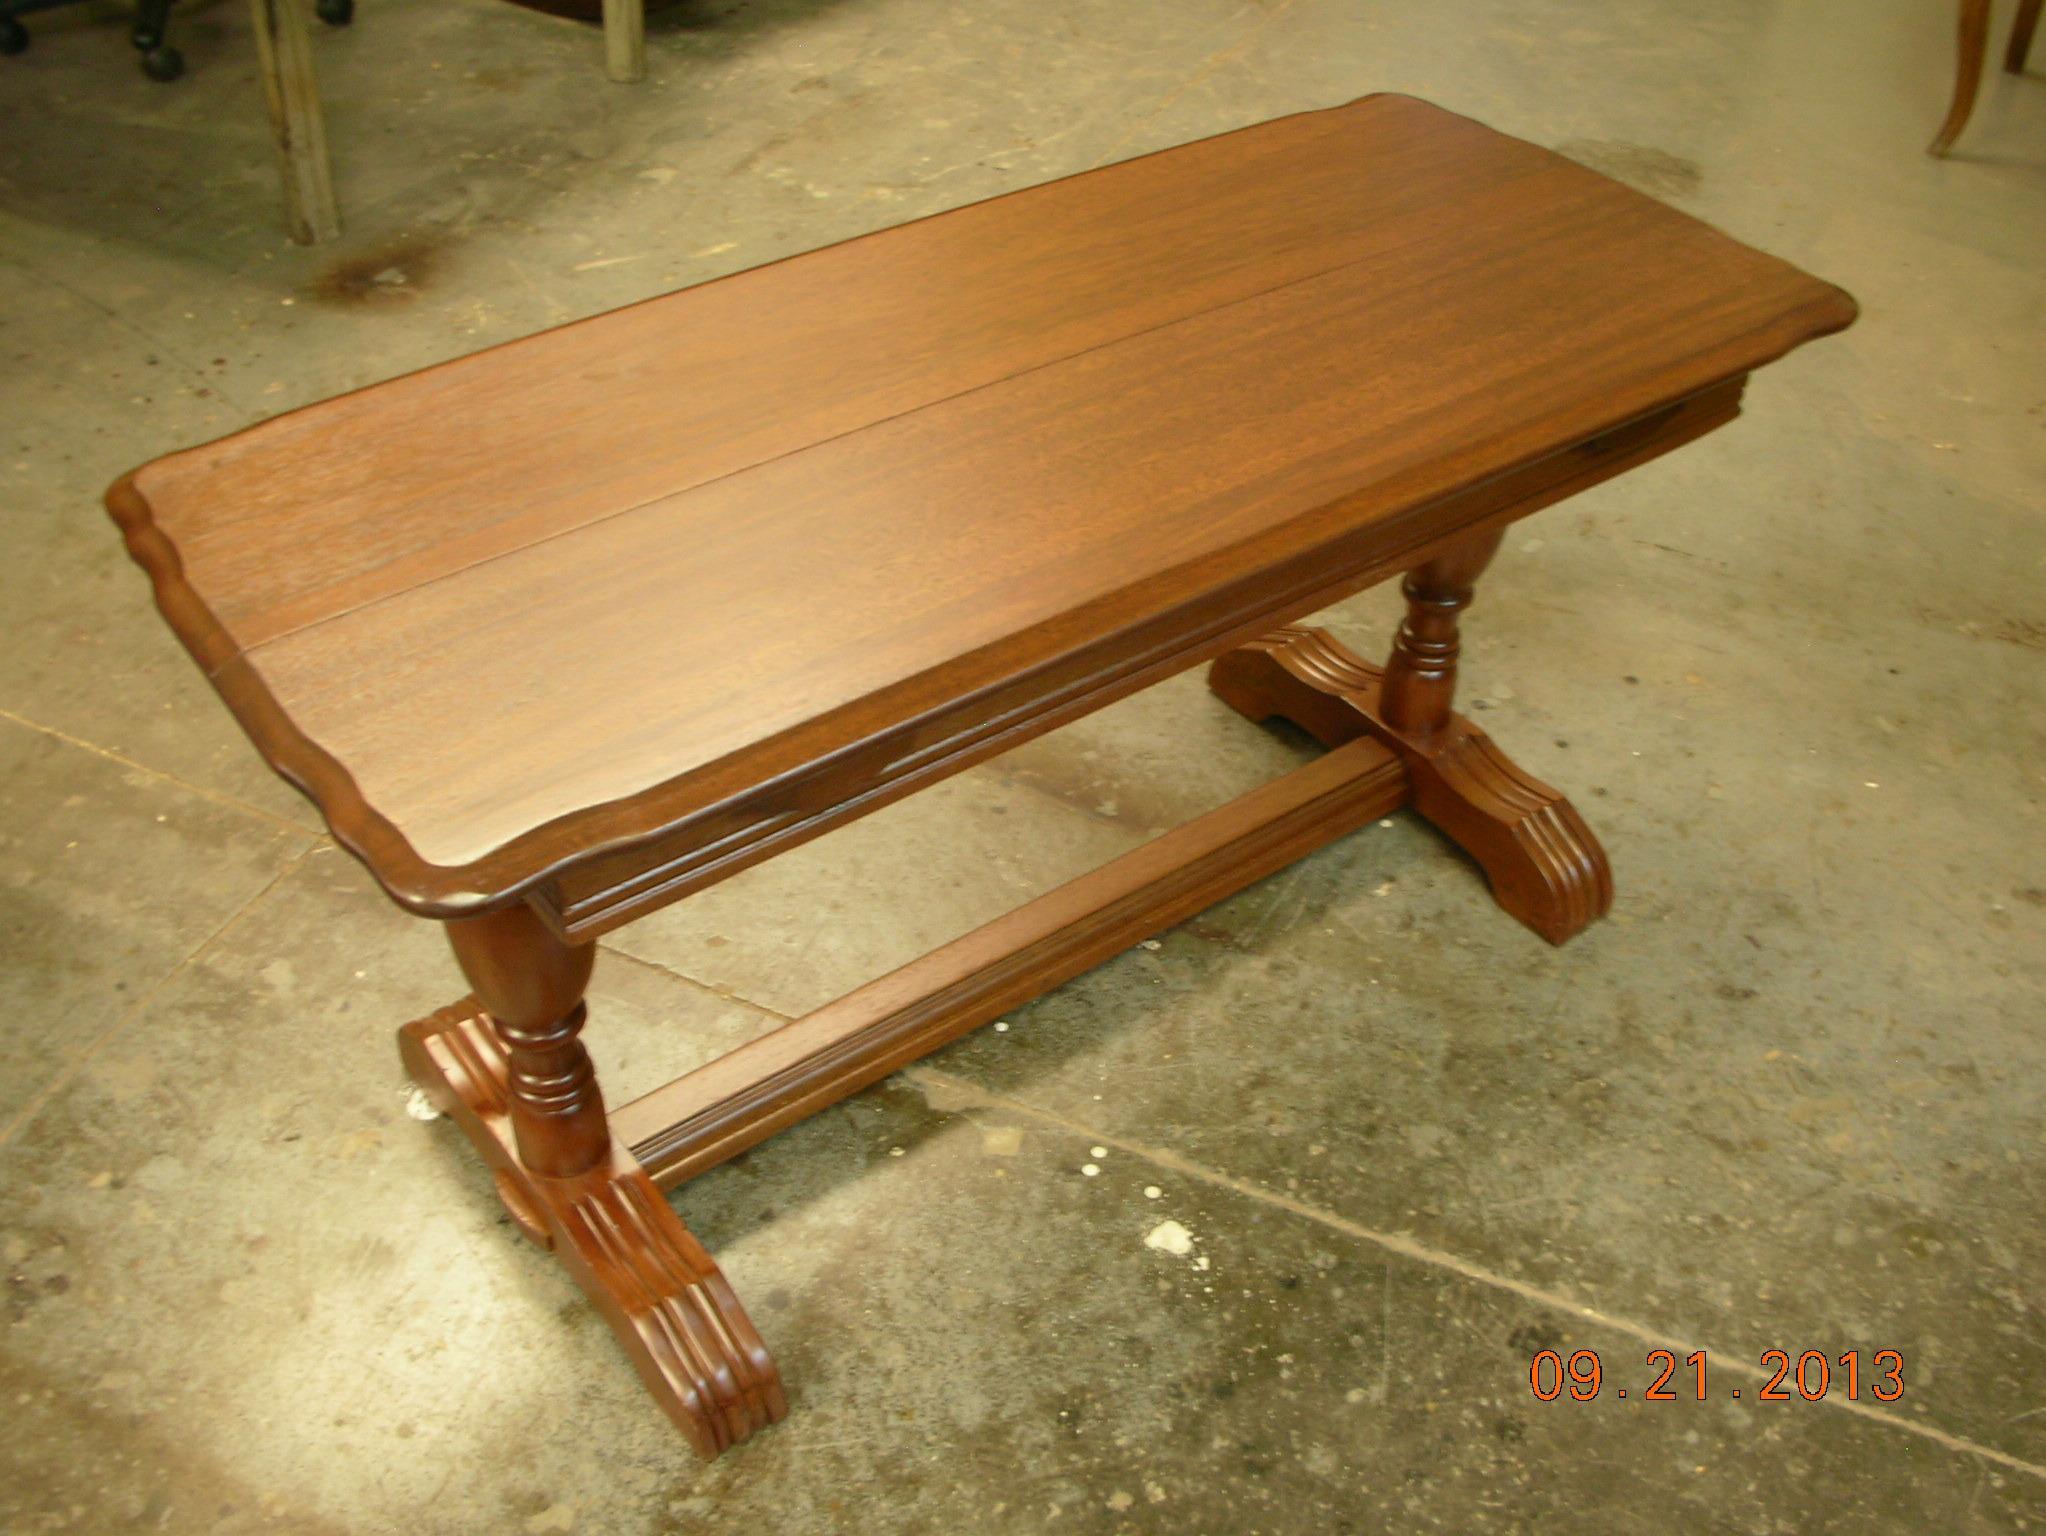 Furniture medic by afd cedar park texas for Cedar park furniture